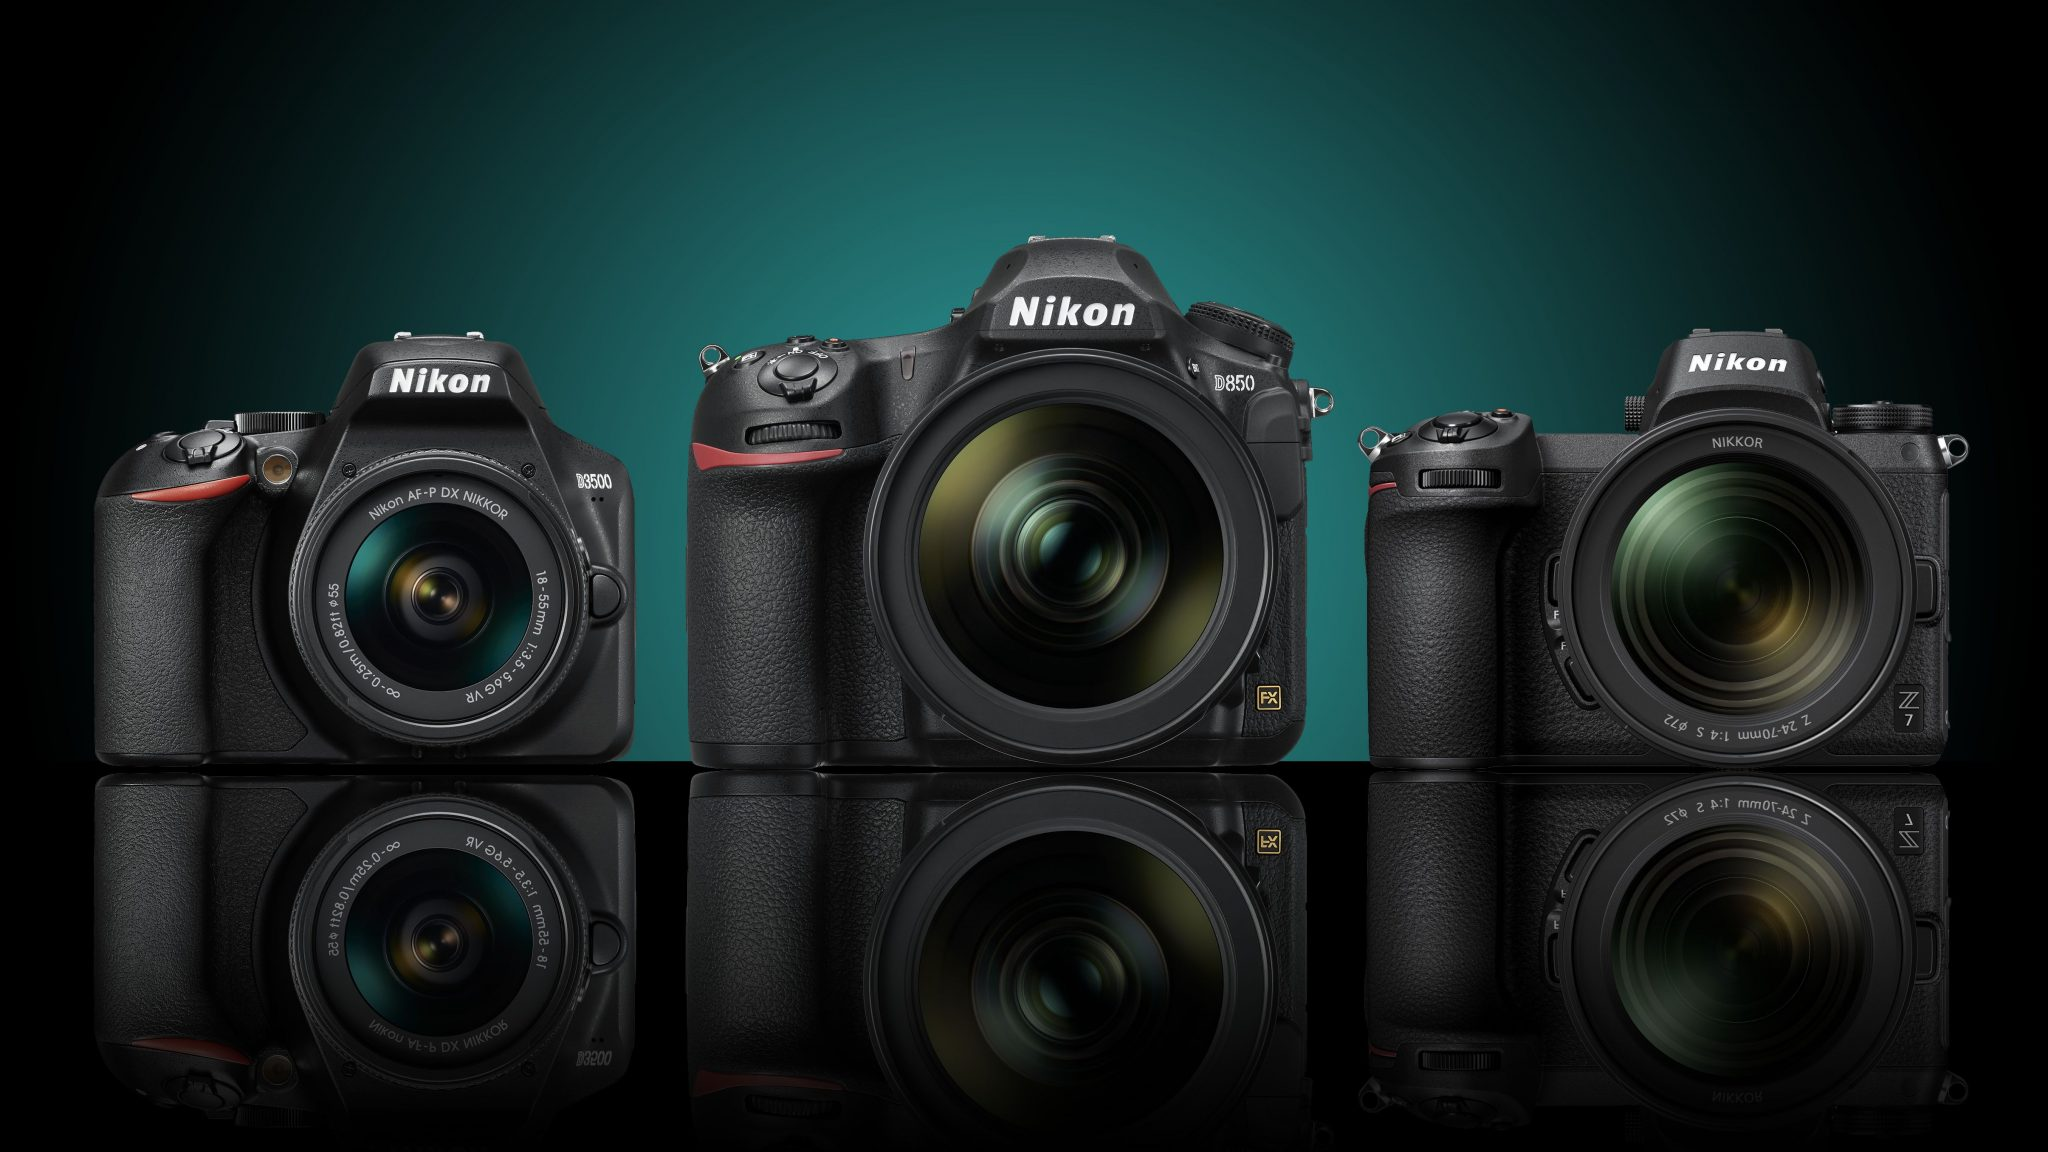 Nikon Oferece Aulas De Fotografia Online Gratuitas Durante Abril